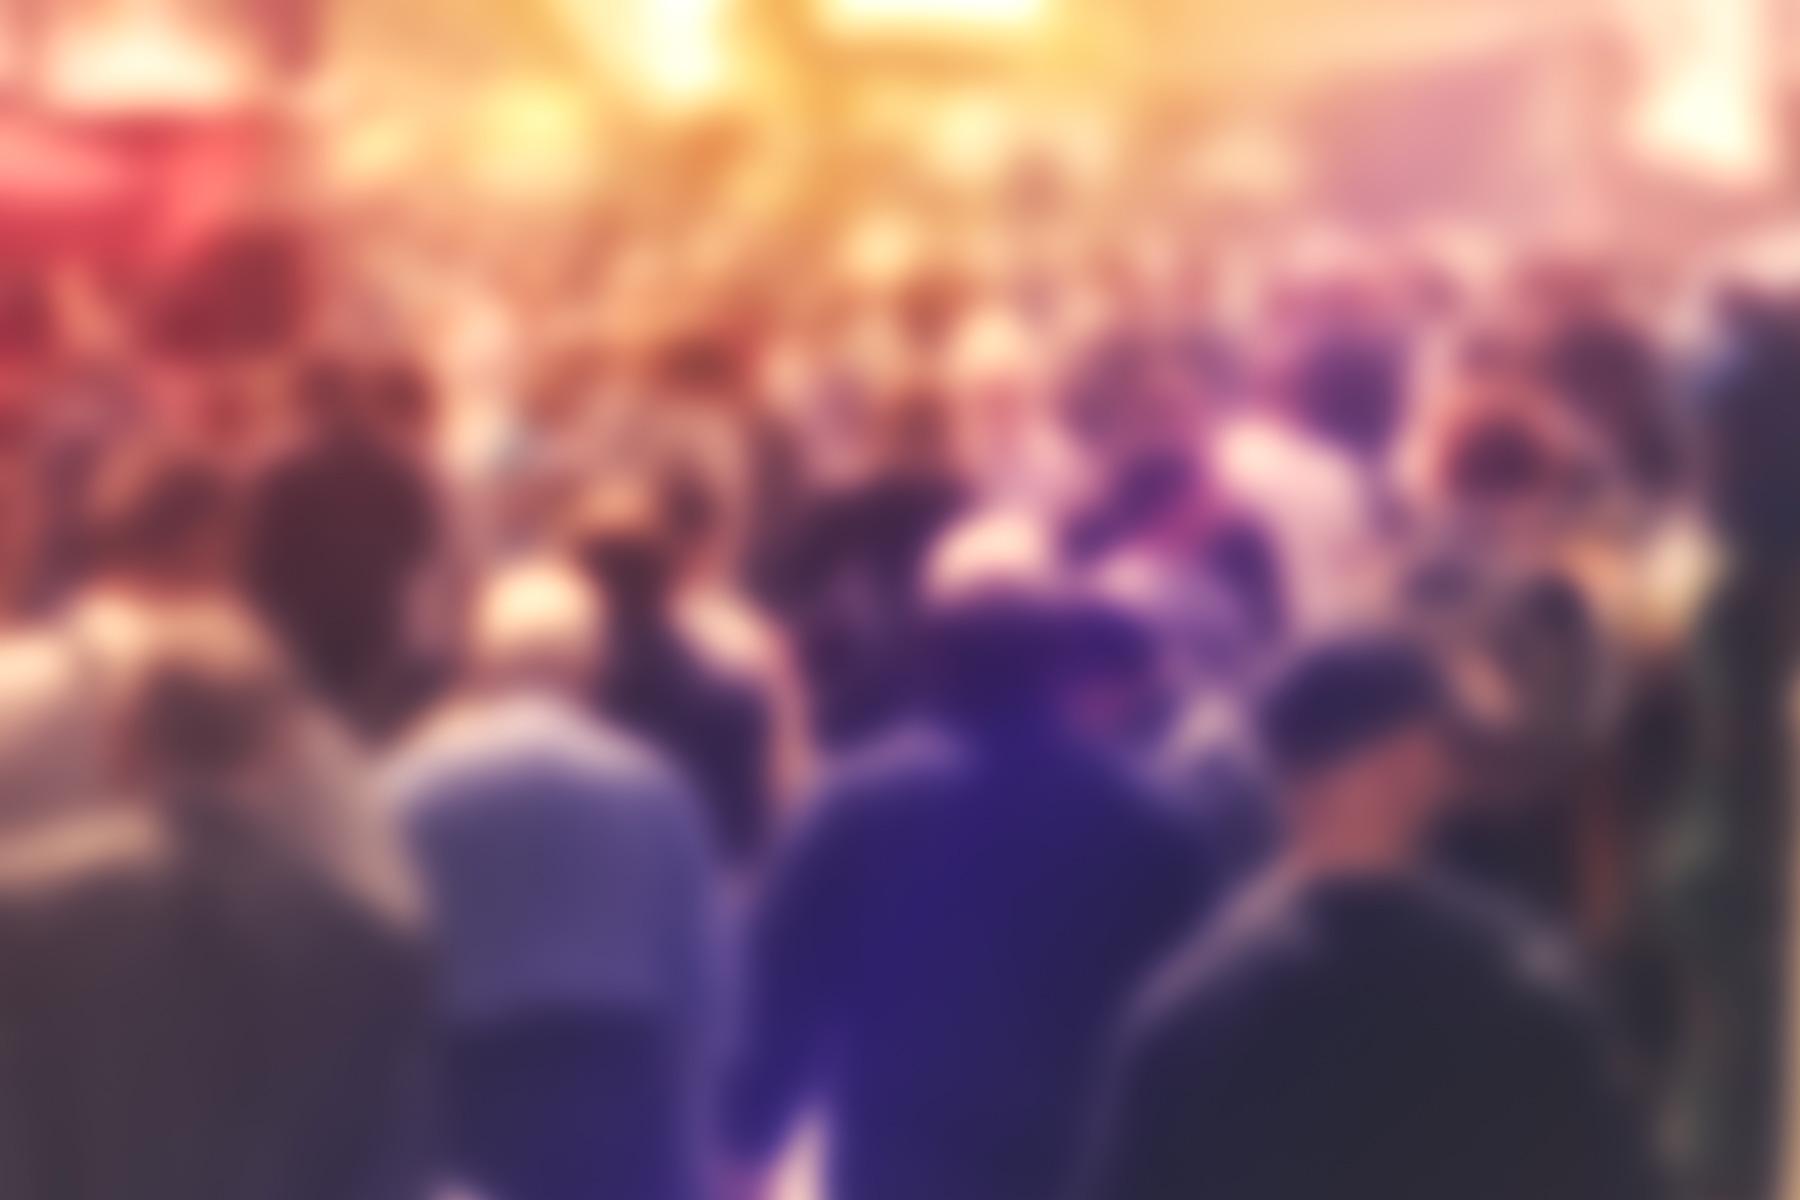 Blurred crowd of people - New Australian Bureau of Statistics Report